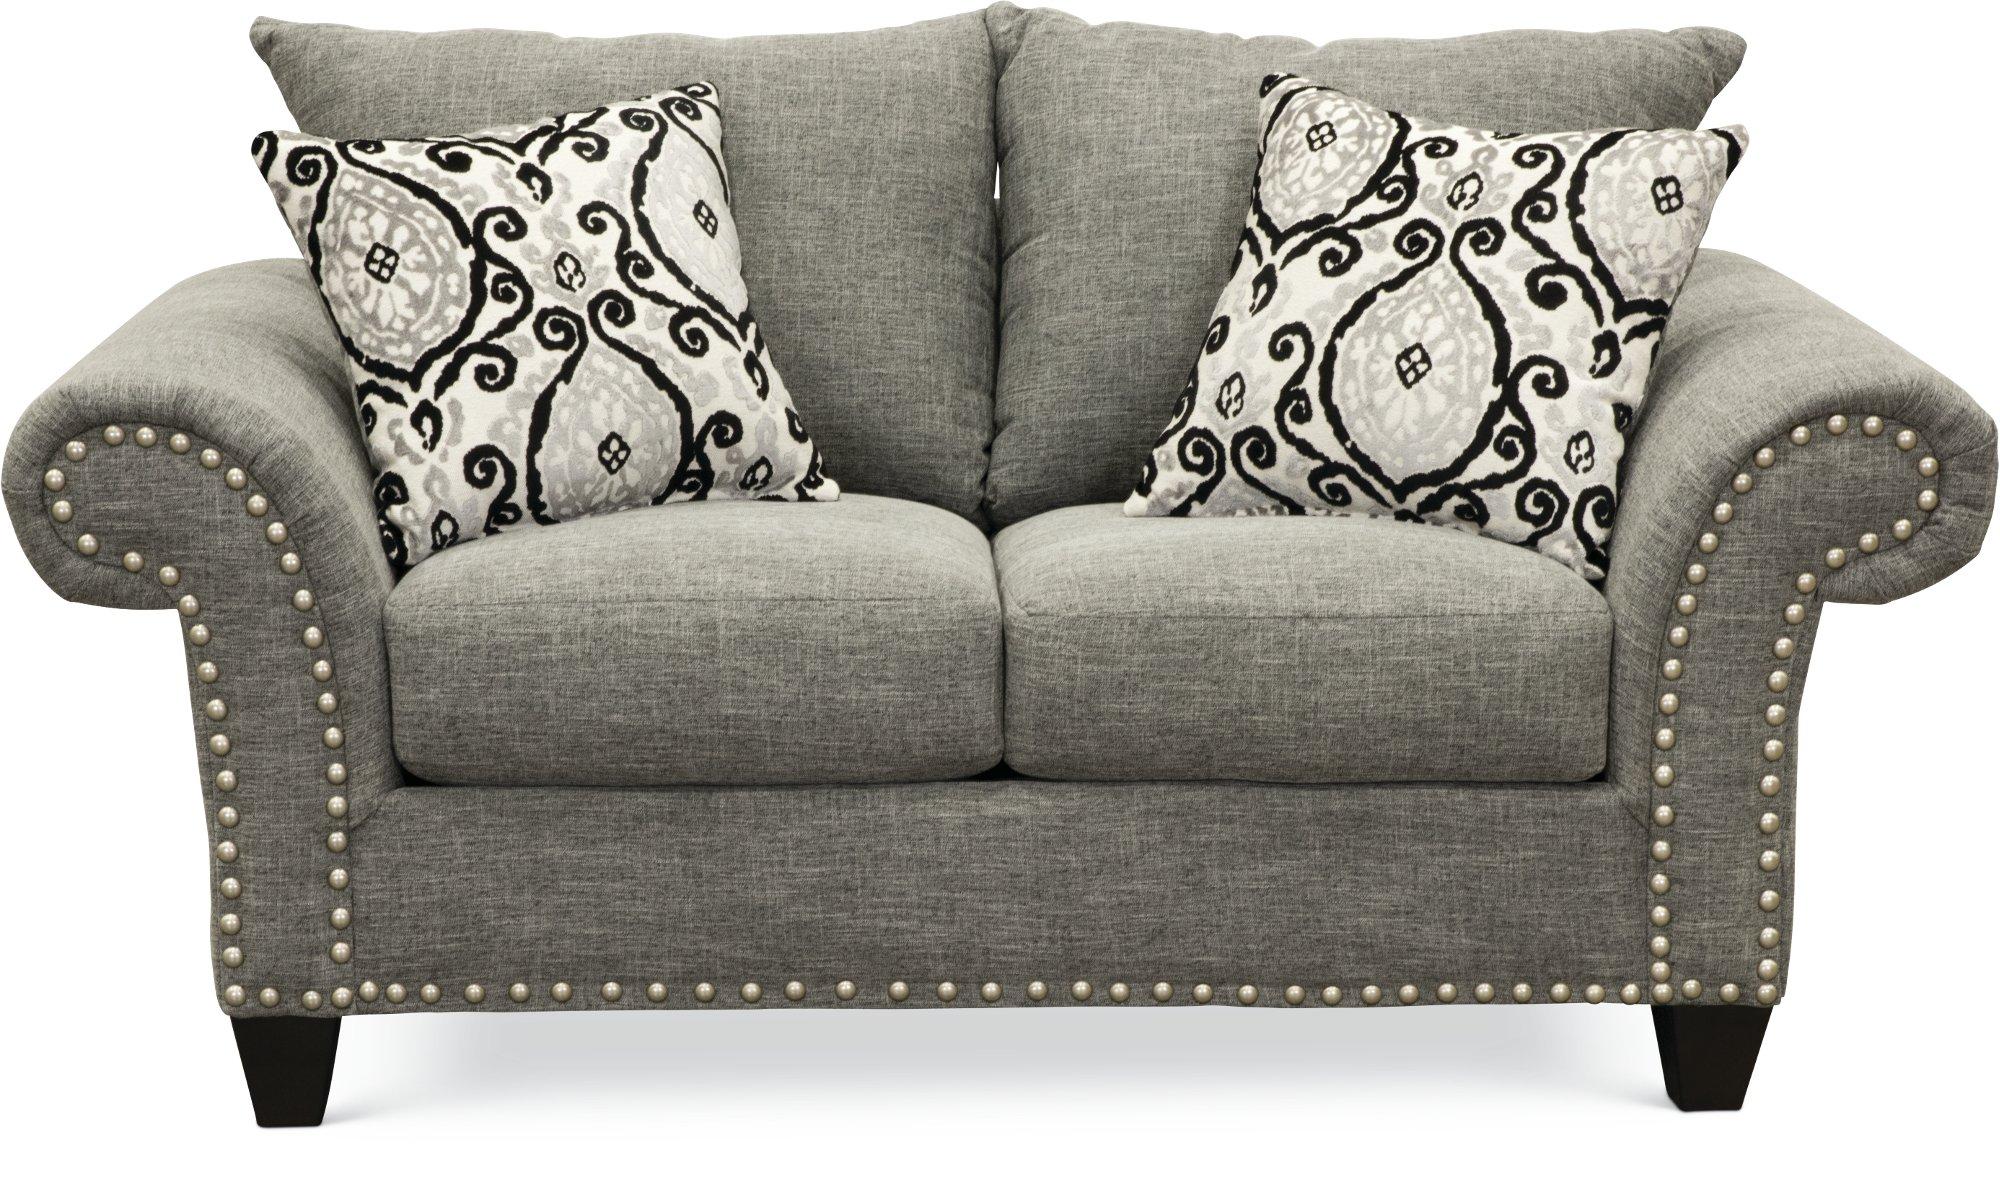 892 The Paradigm Living Room Set Grey: Casual Traditional Gray 2 Piece Living Room Set